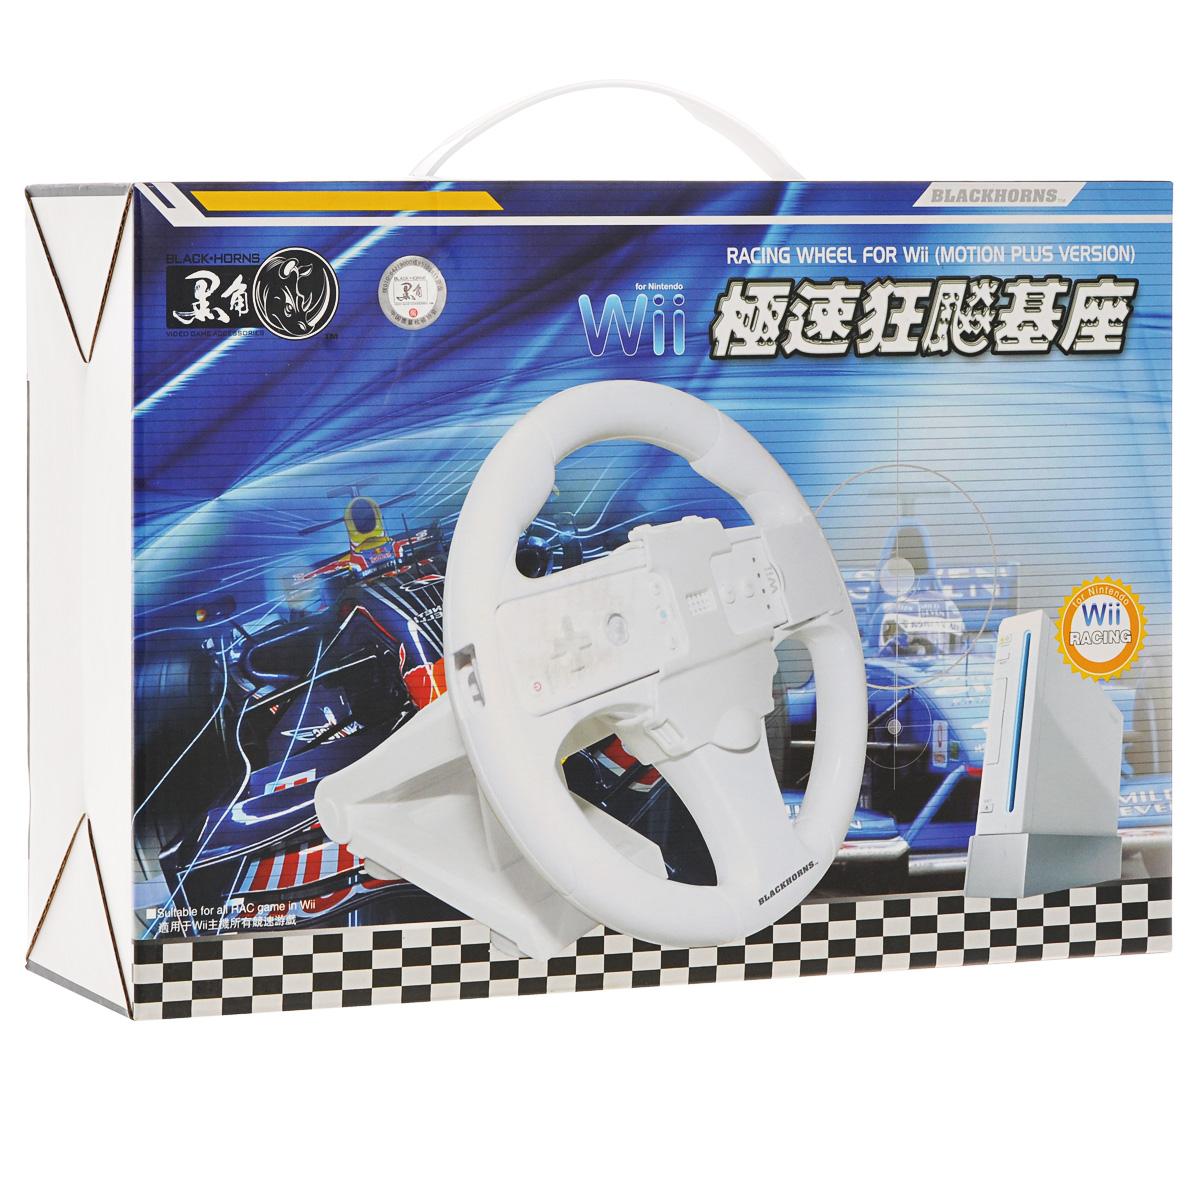 Black Horns руль с опорой для приставки Wii (белый)